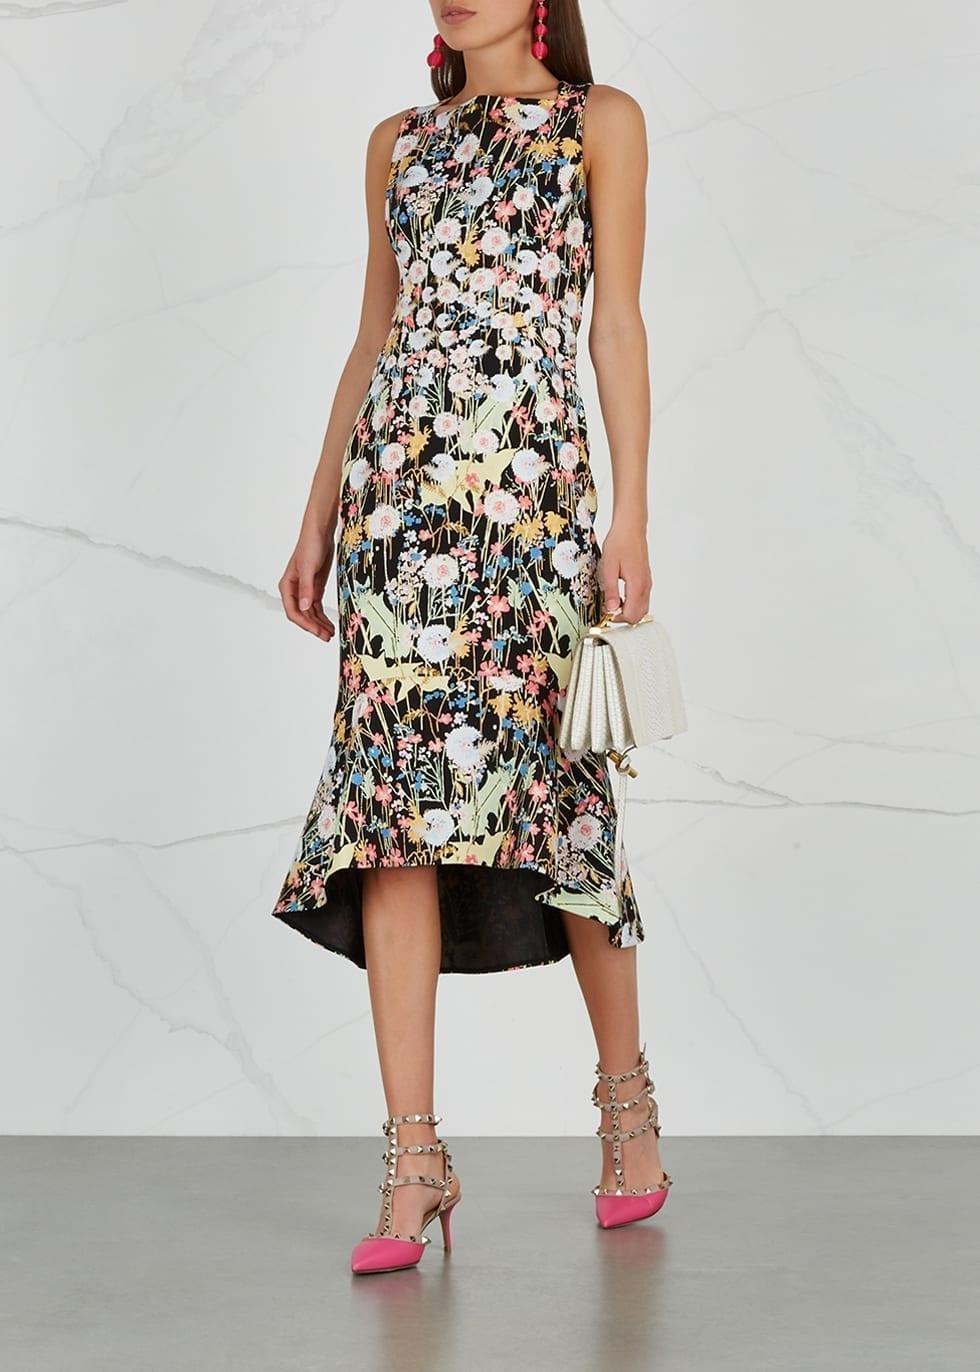 PETER PILOTTO Kia Cady Midi Black / Floral printed Dress